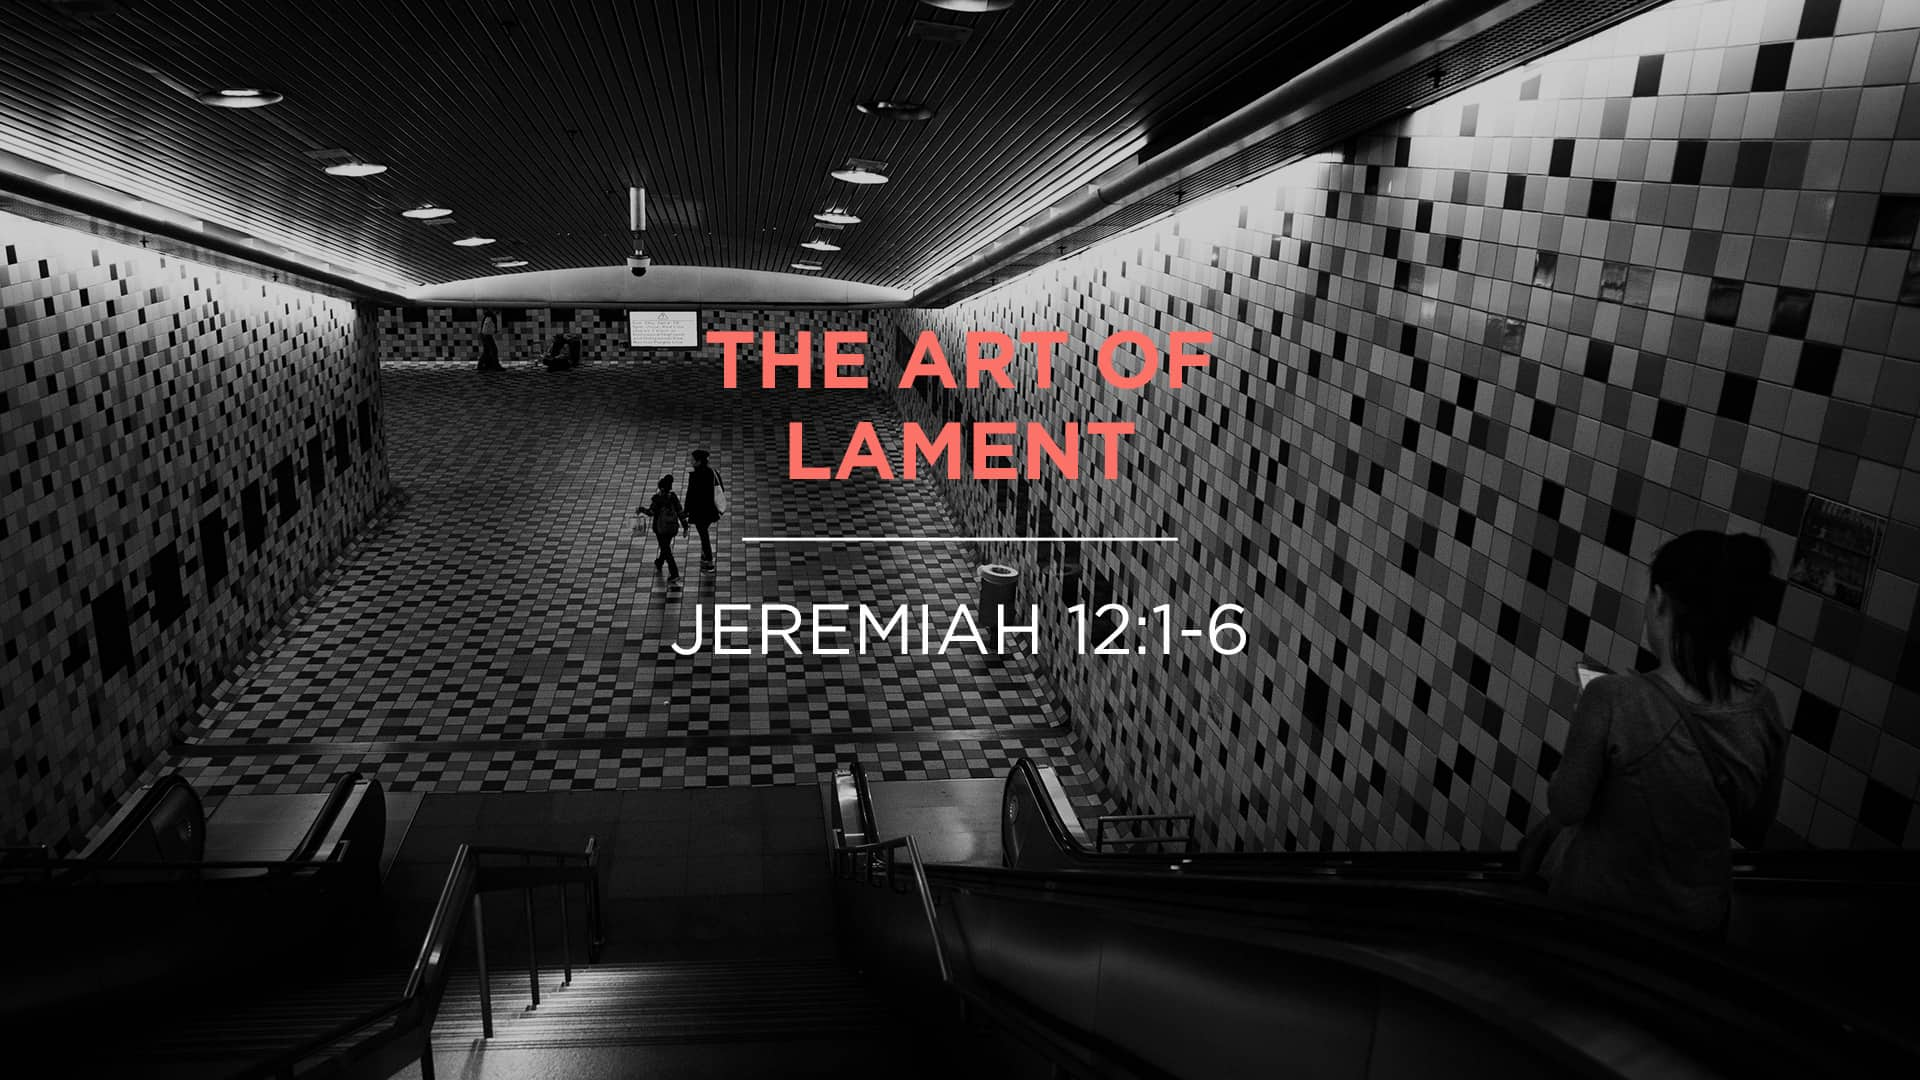 The Art of Lament